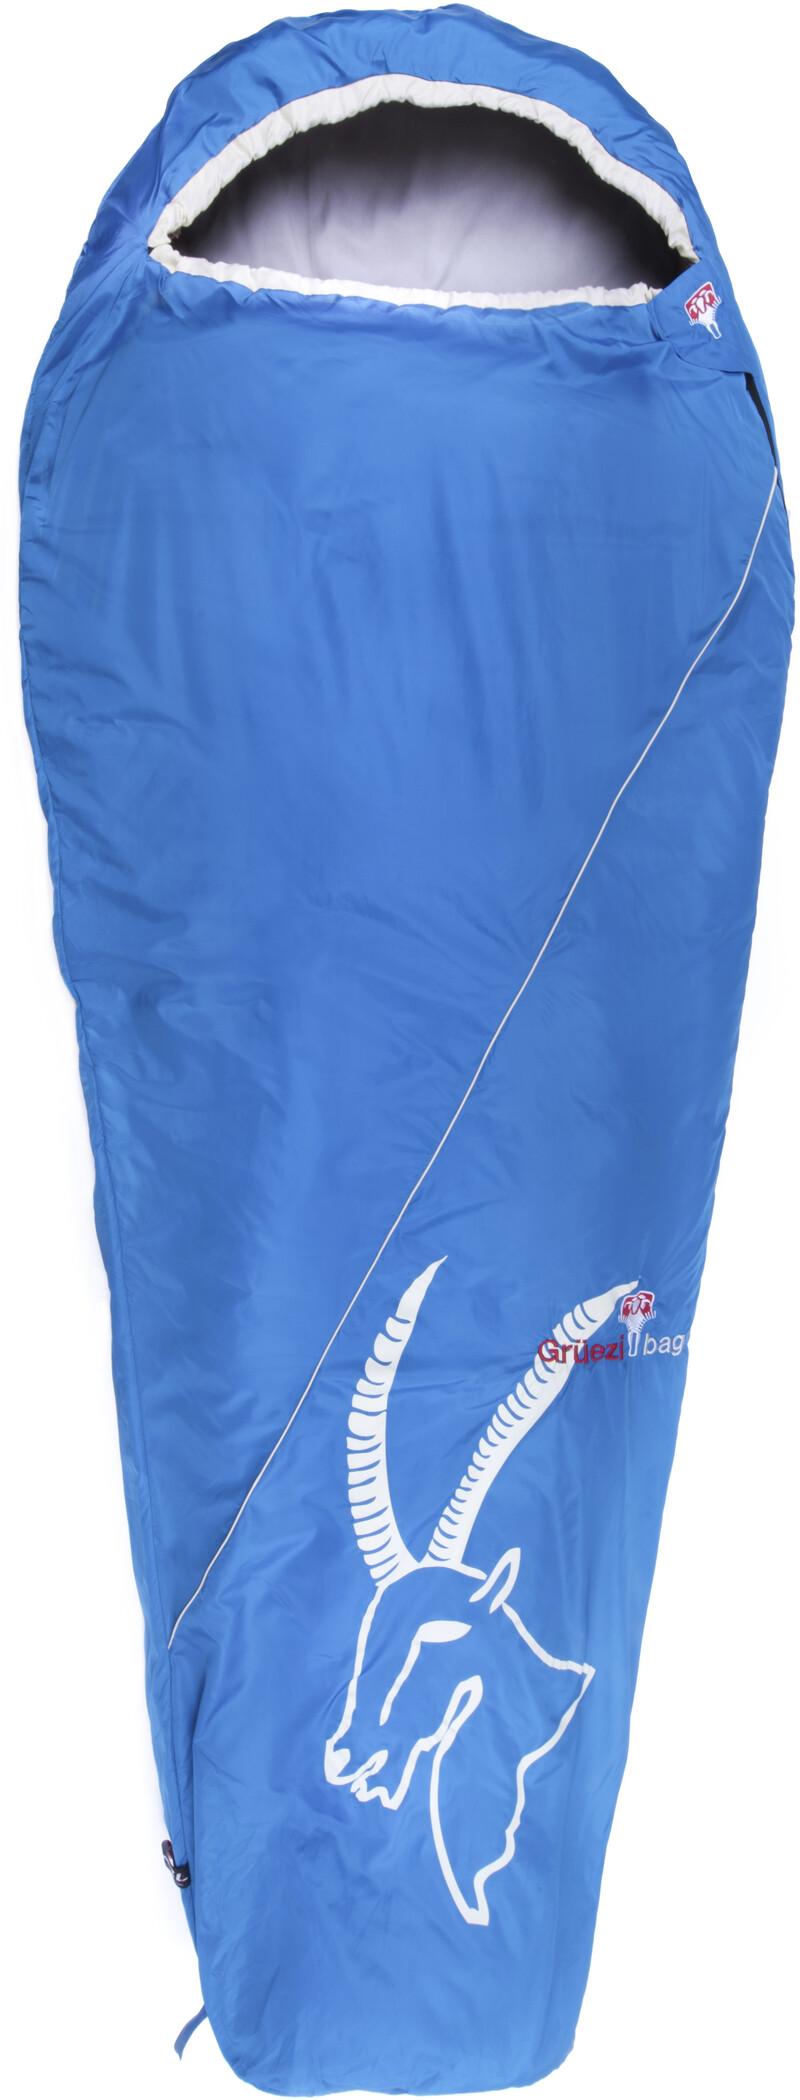 Grüezi-Bag Cloud Sovepose, blue/Stonebuck | Transport og opbevaring > Tilbehør